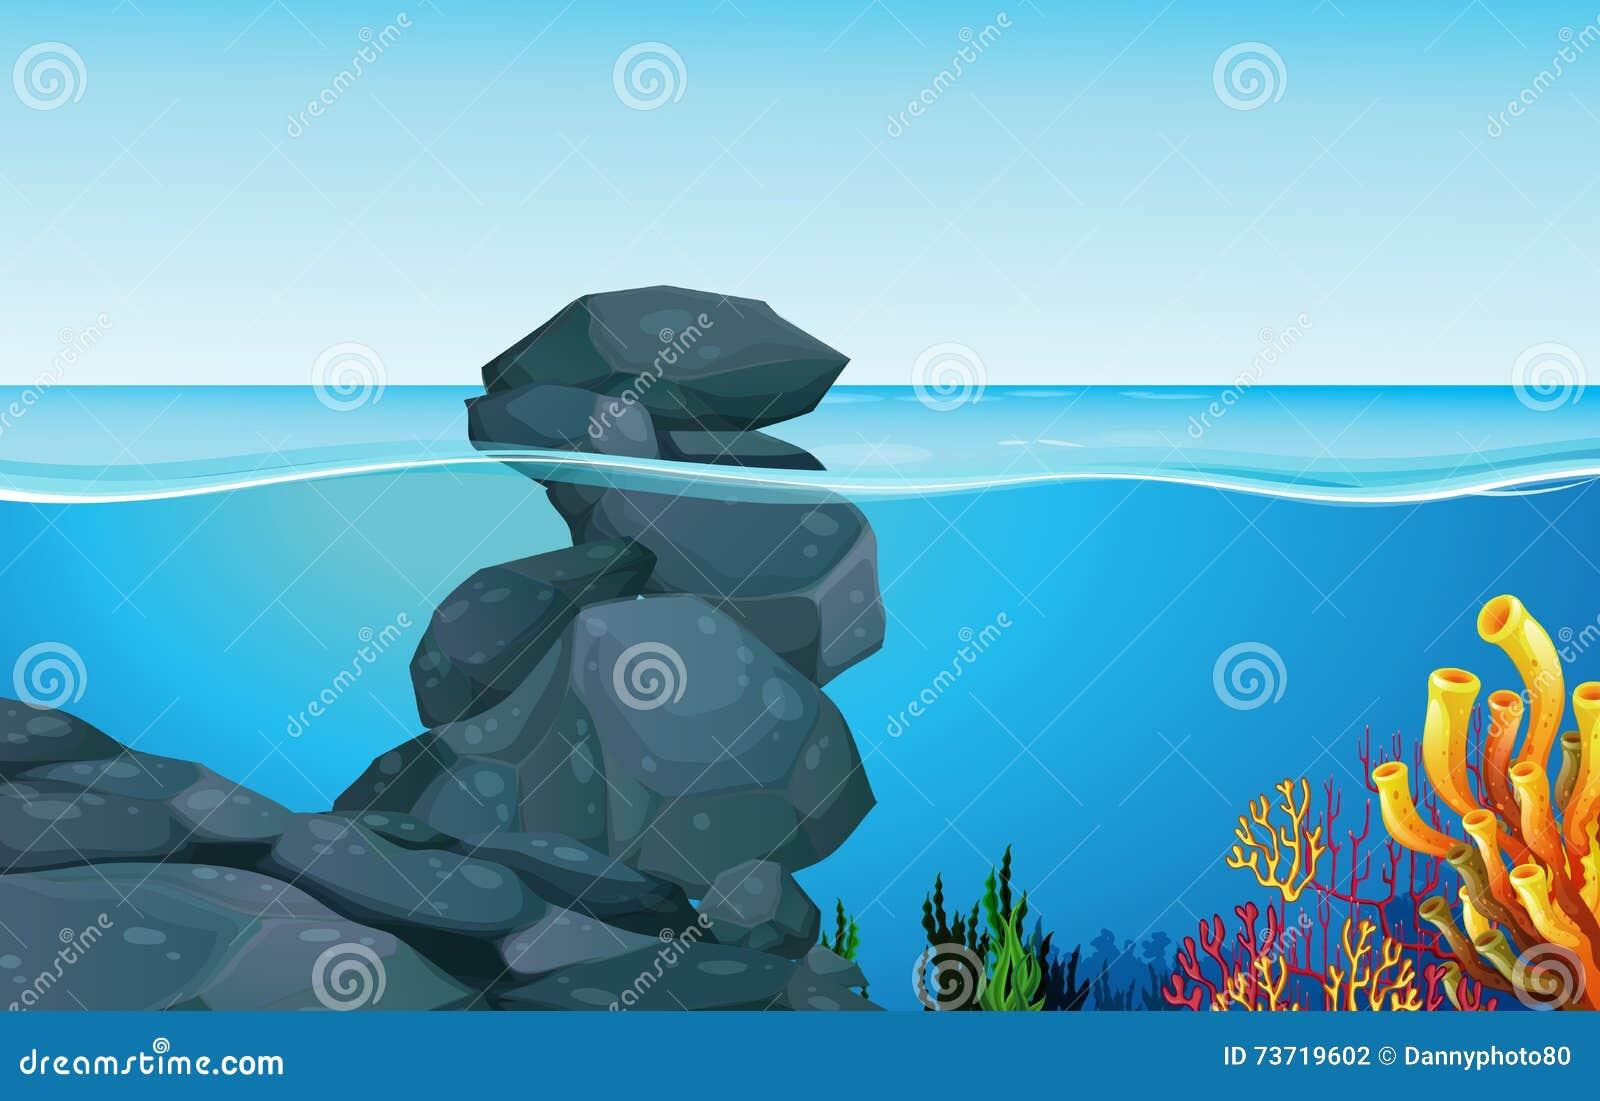 Scene with rocks under the ocean